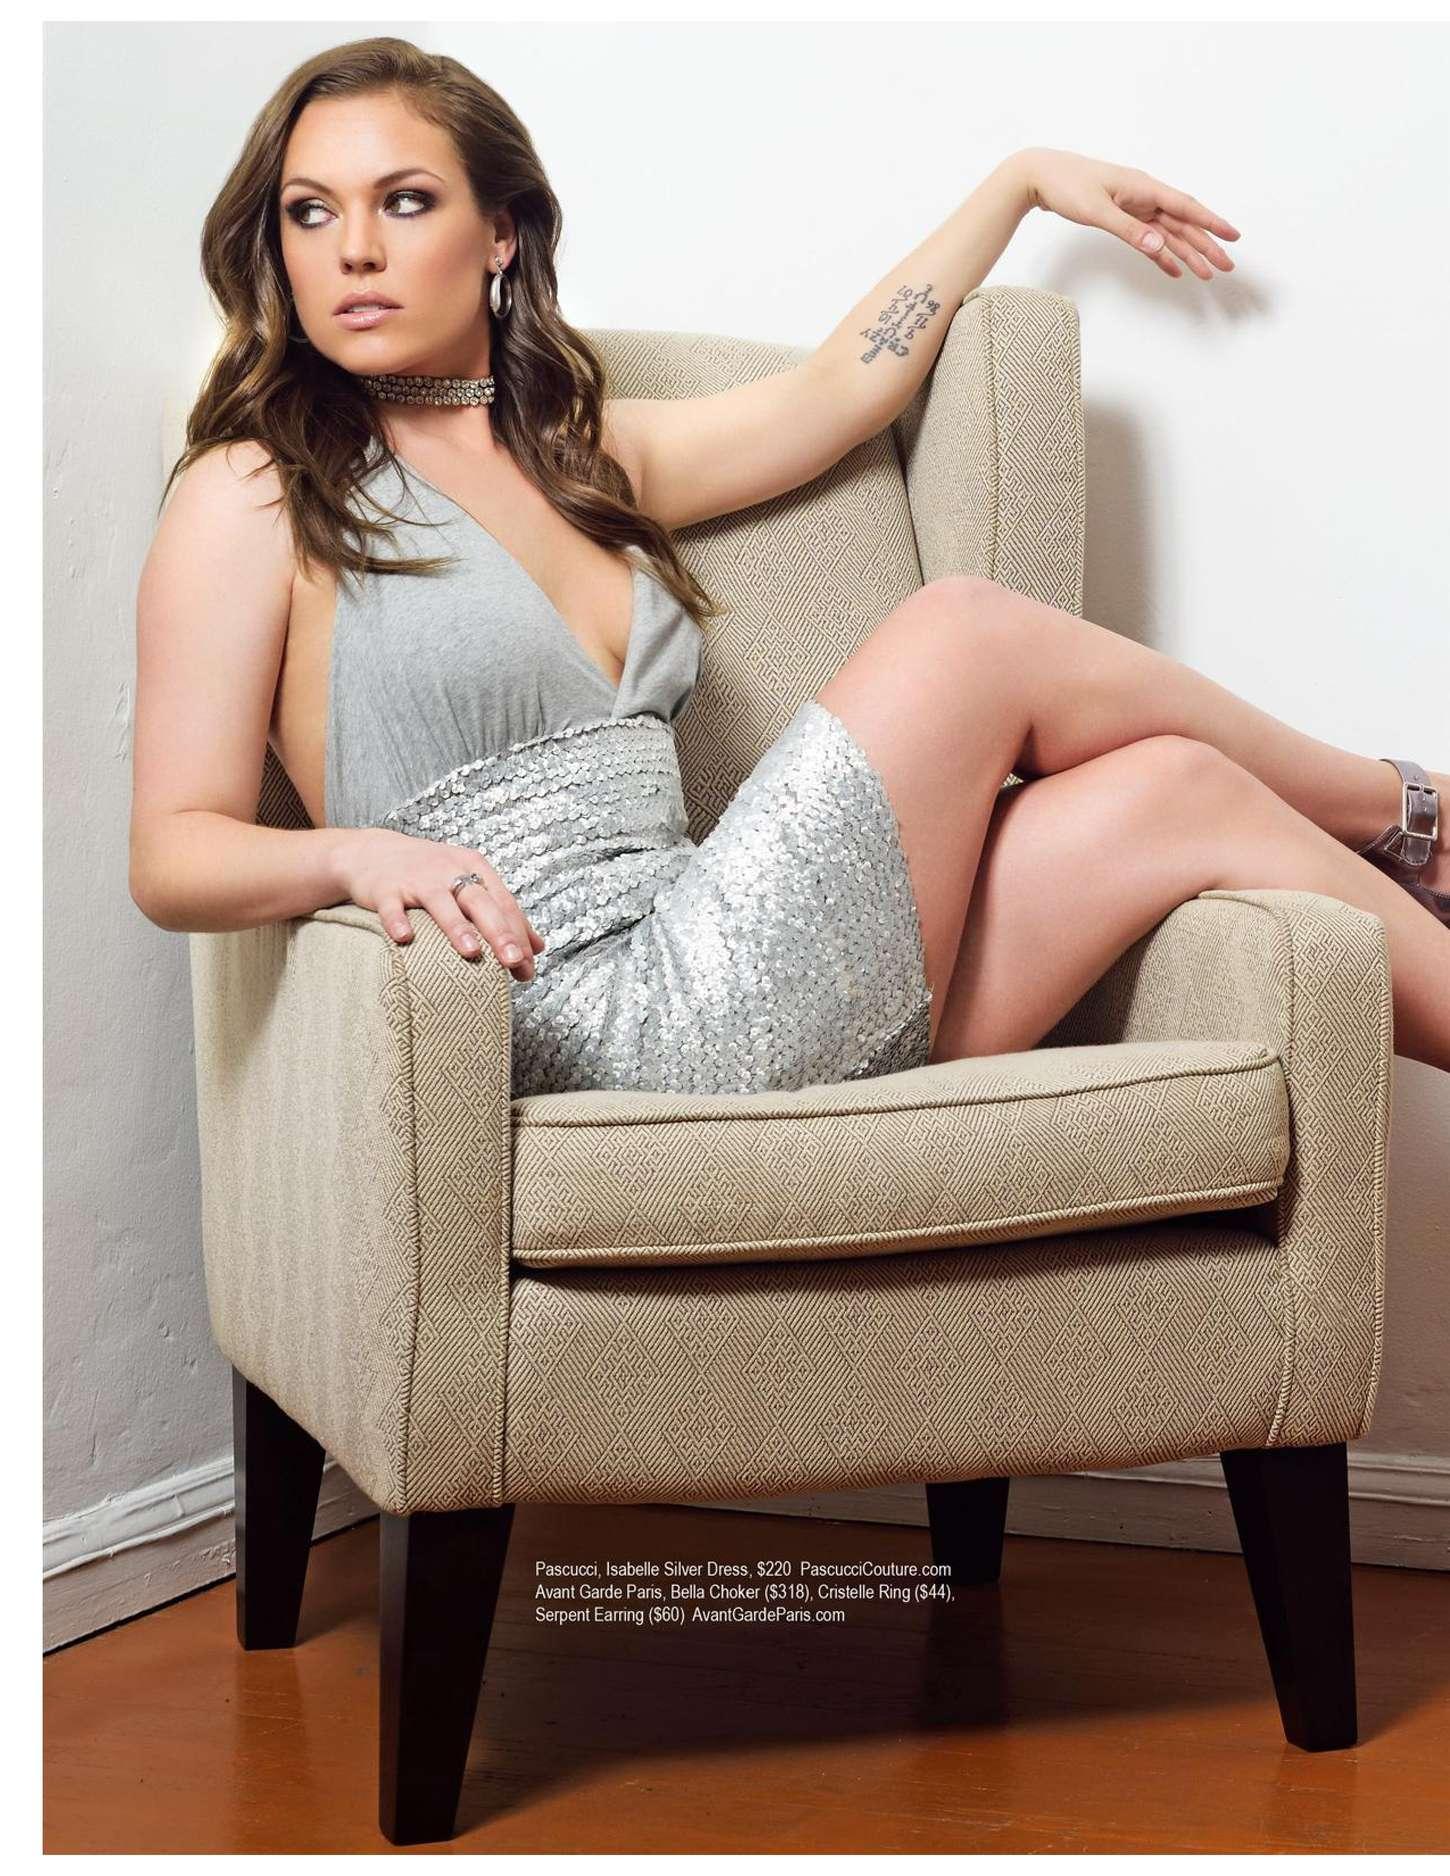 agnes bruckner seductive hot - photo #23